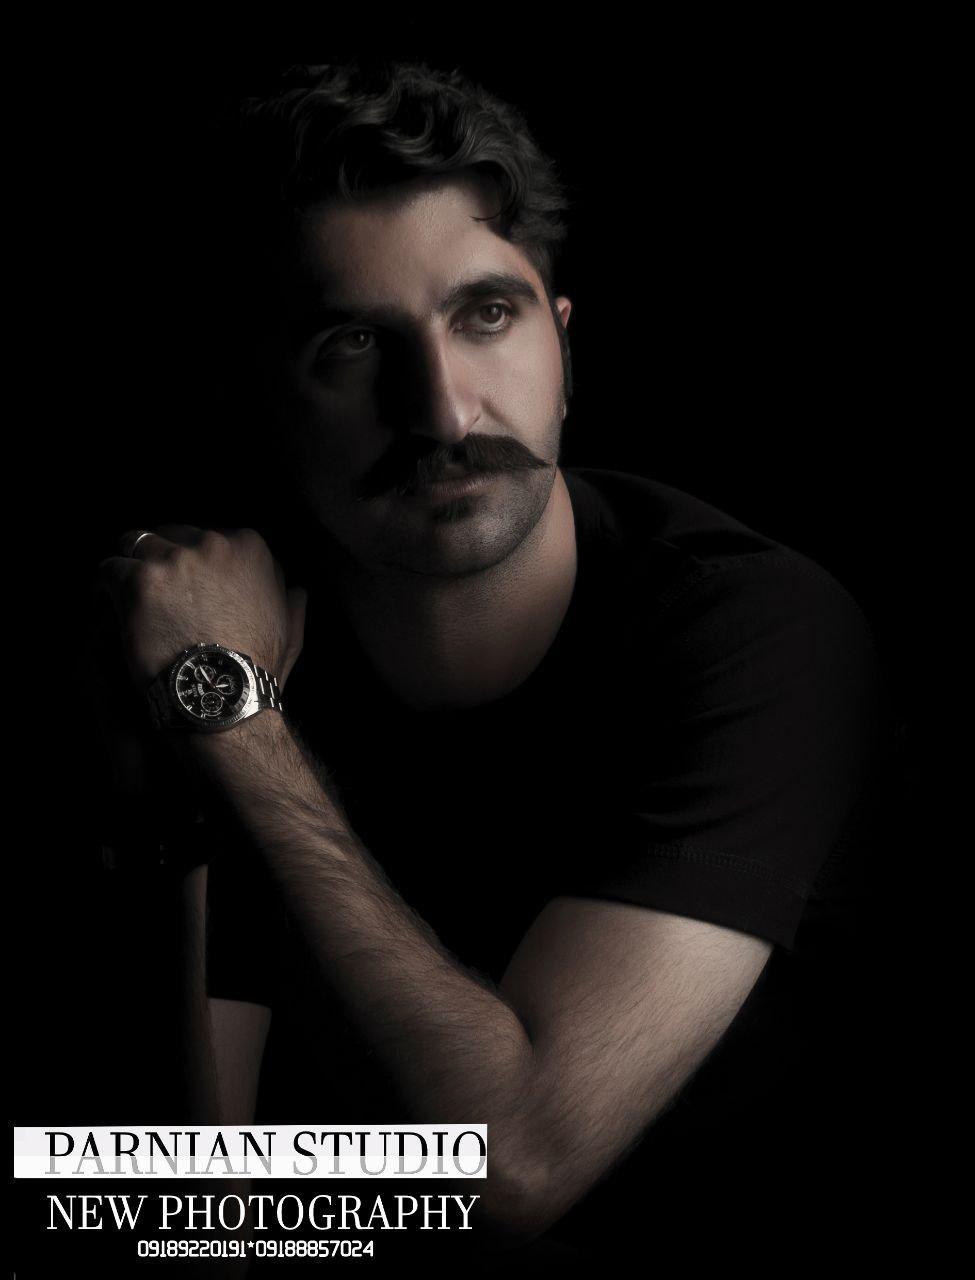 جدیدترین تصاویر هنرمند وحید اکجوان